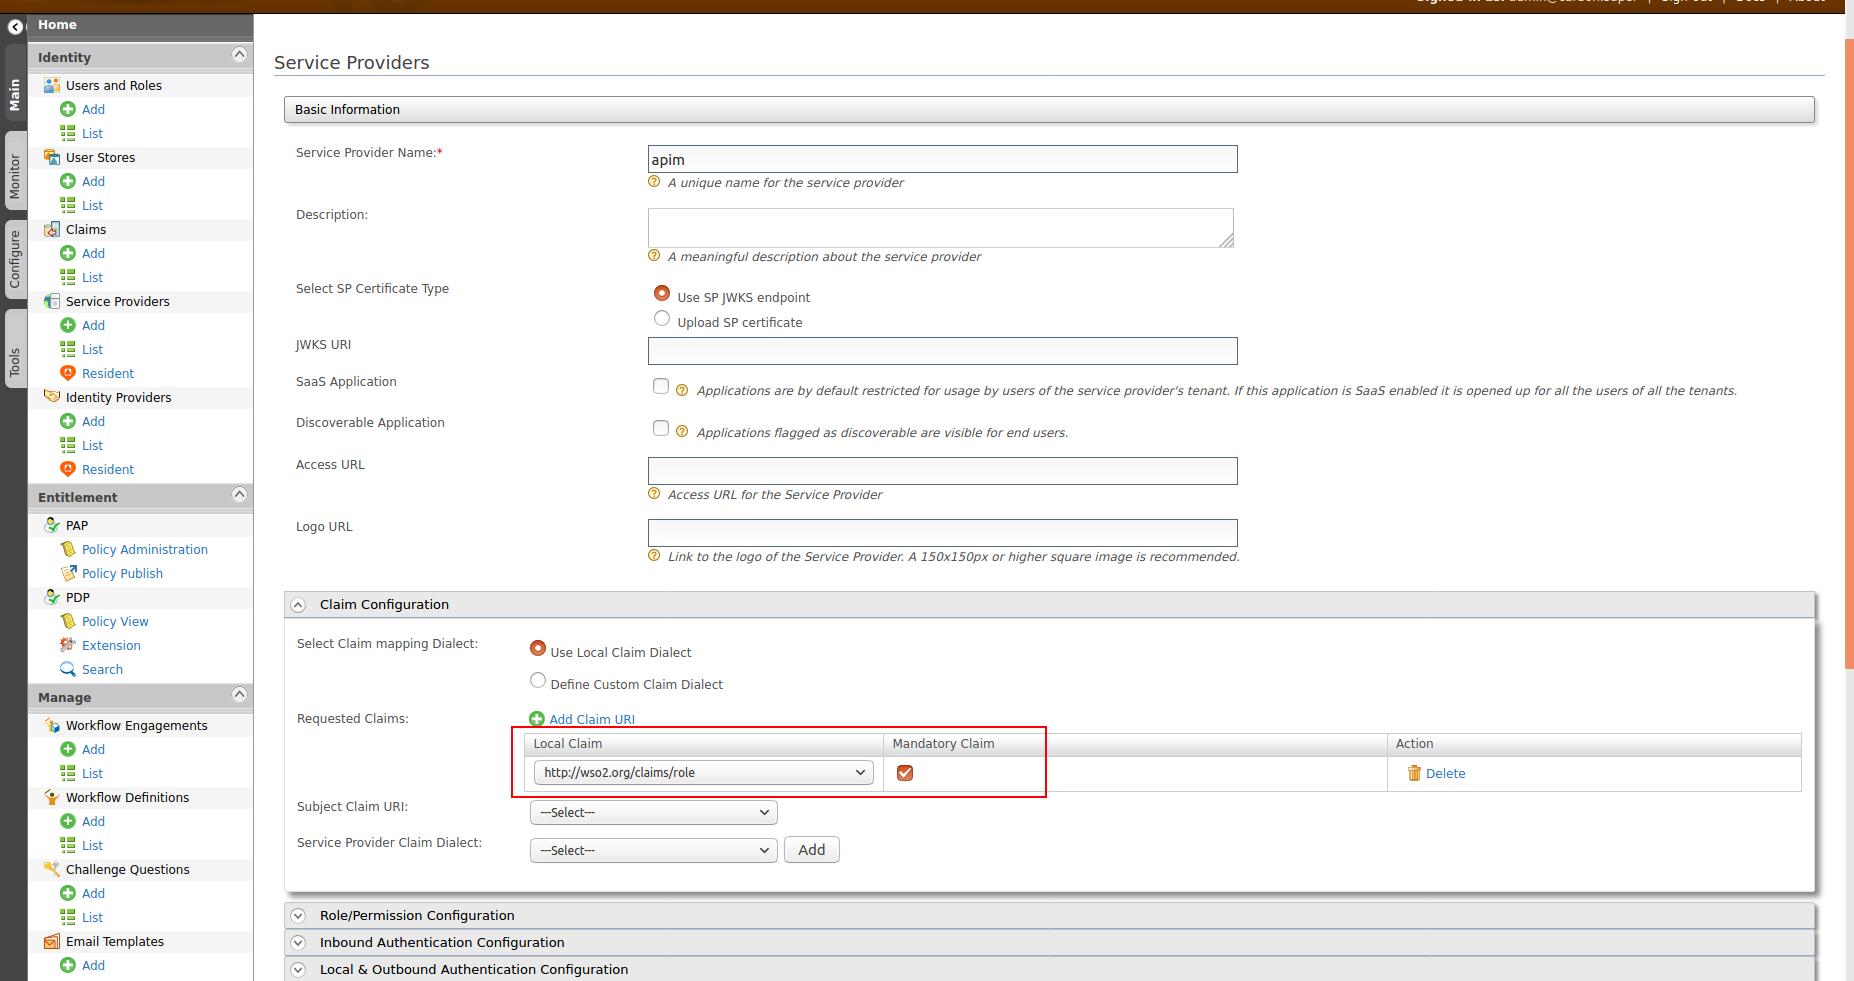 Claim Configuration in Service Provider